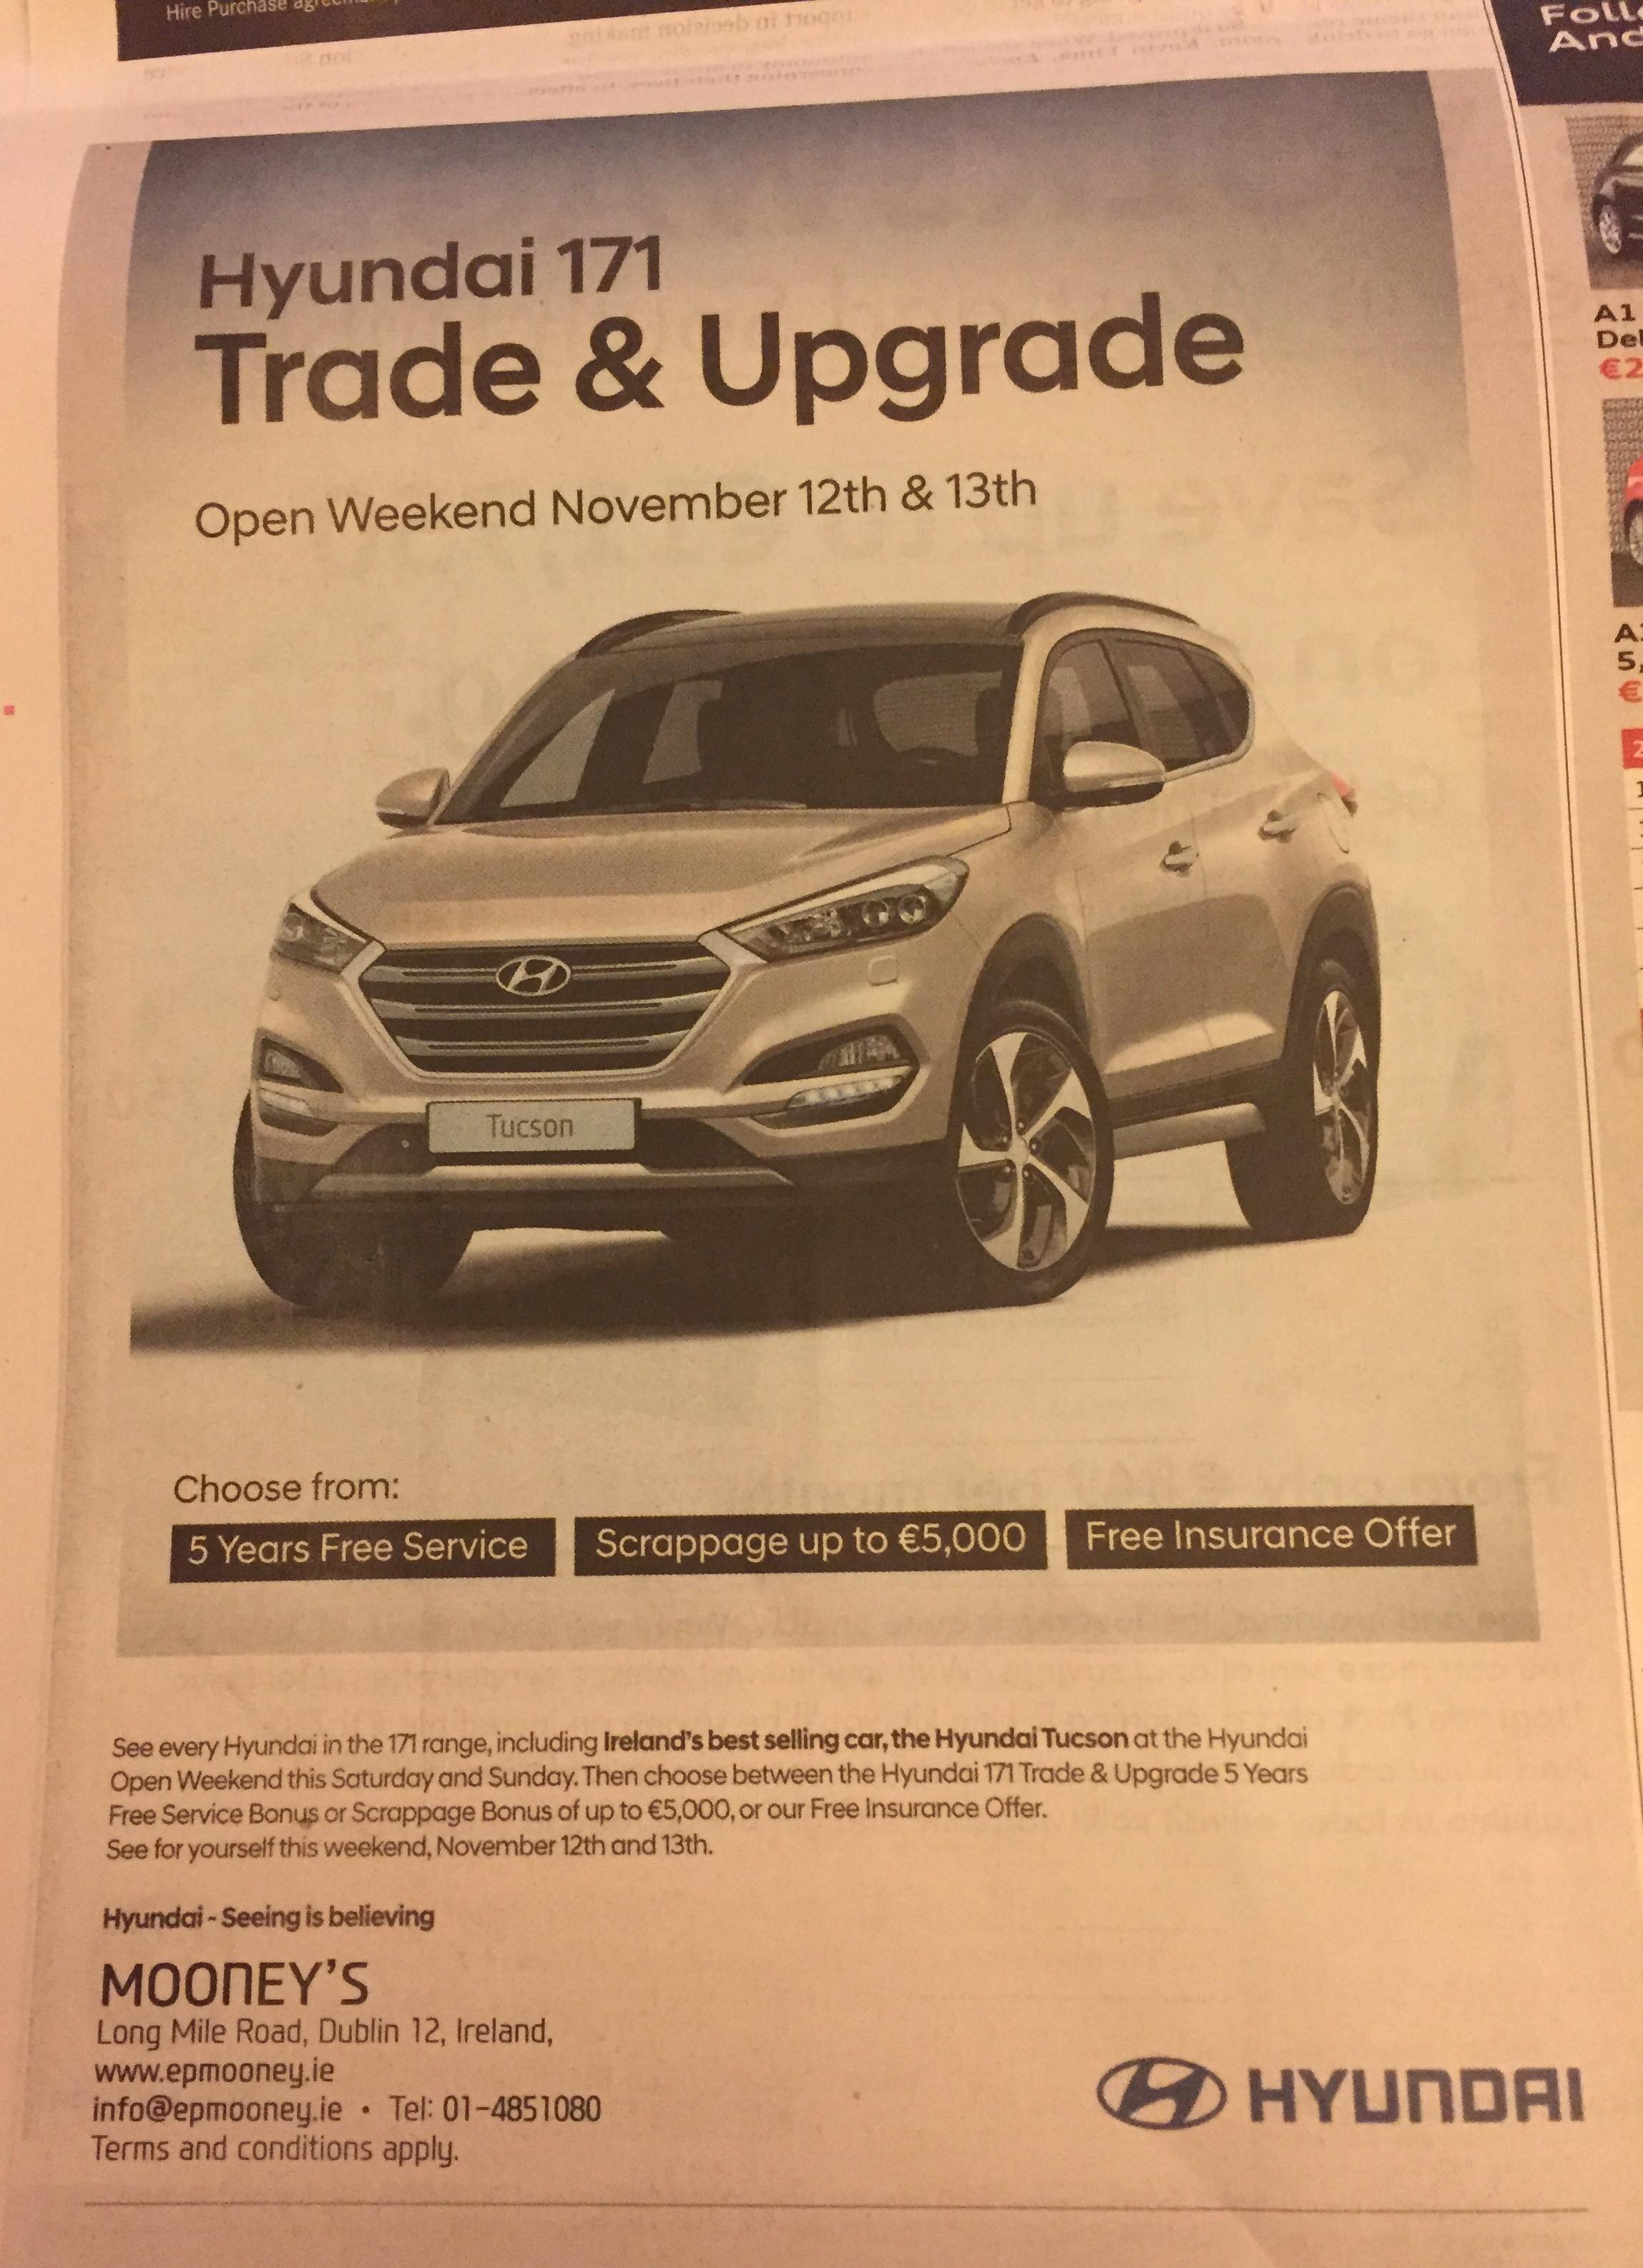 Hyundai – Hyundai 171 trade and upgrade – Mooney's